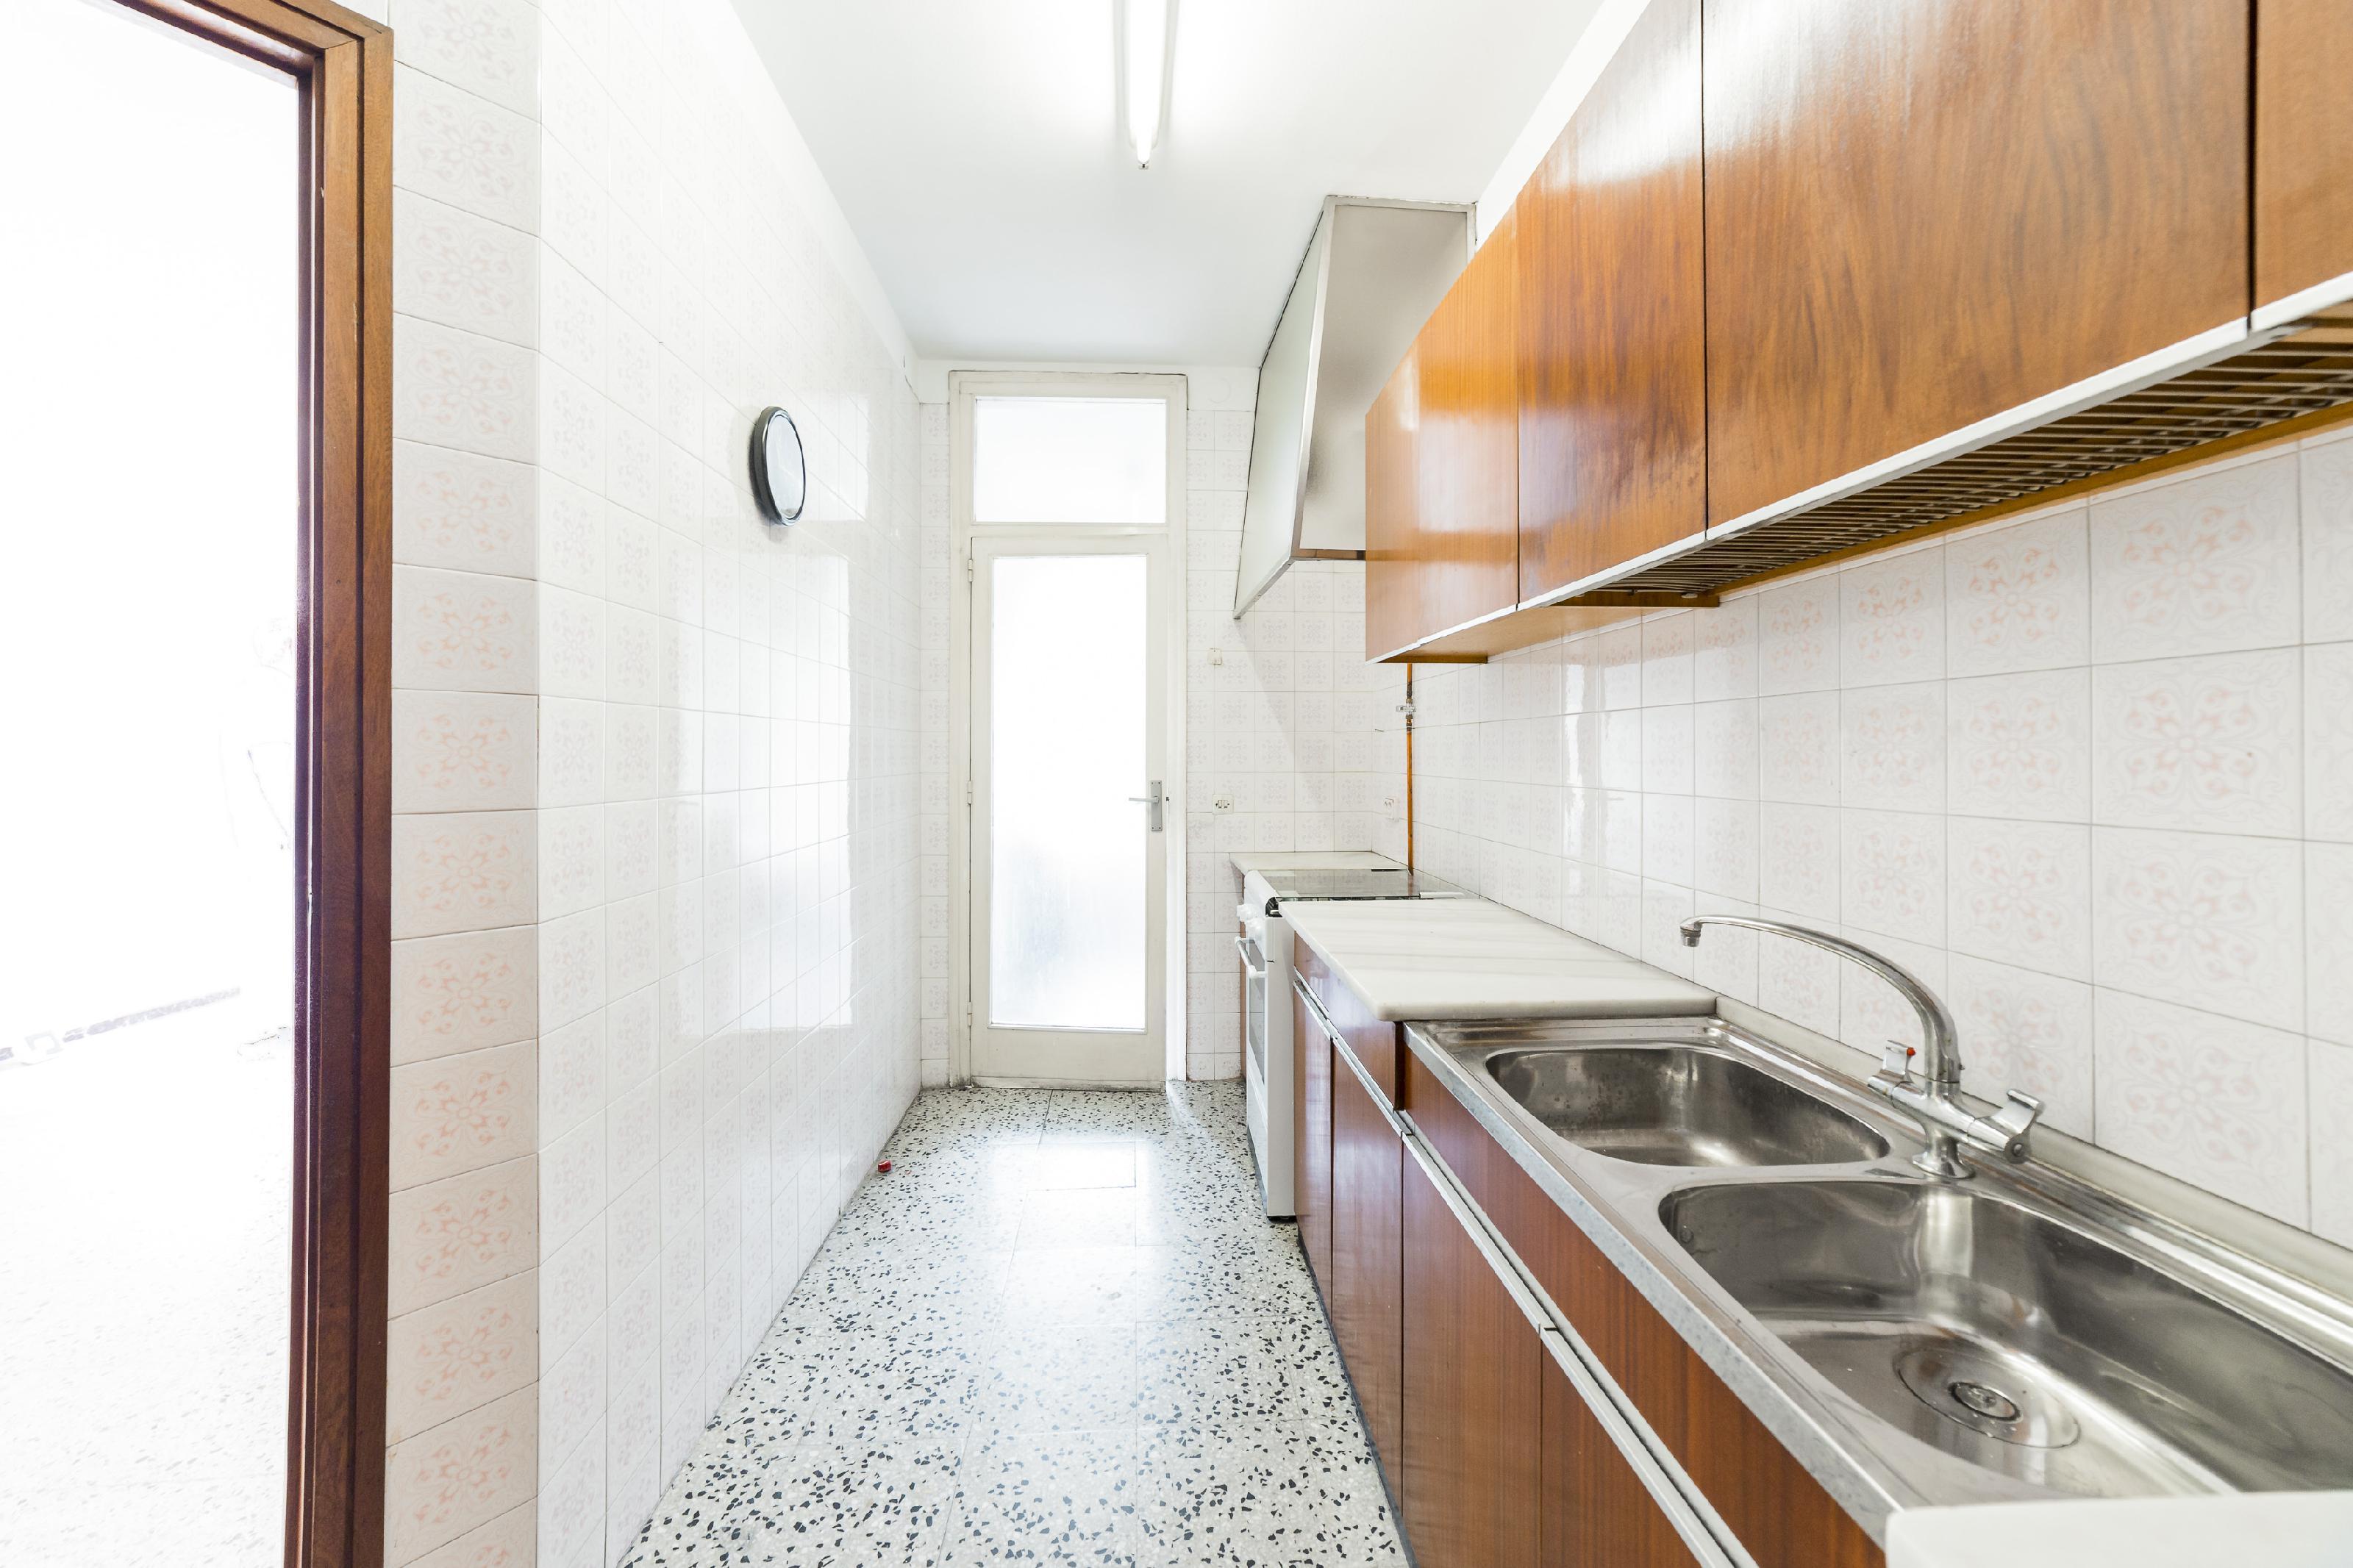 247624 Flat for sale in Eixample, Sant Antoni 12